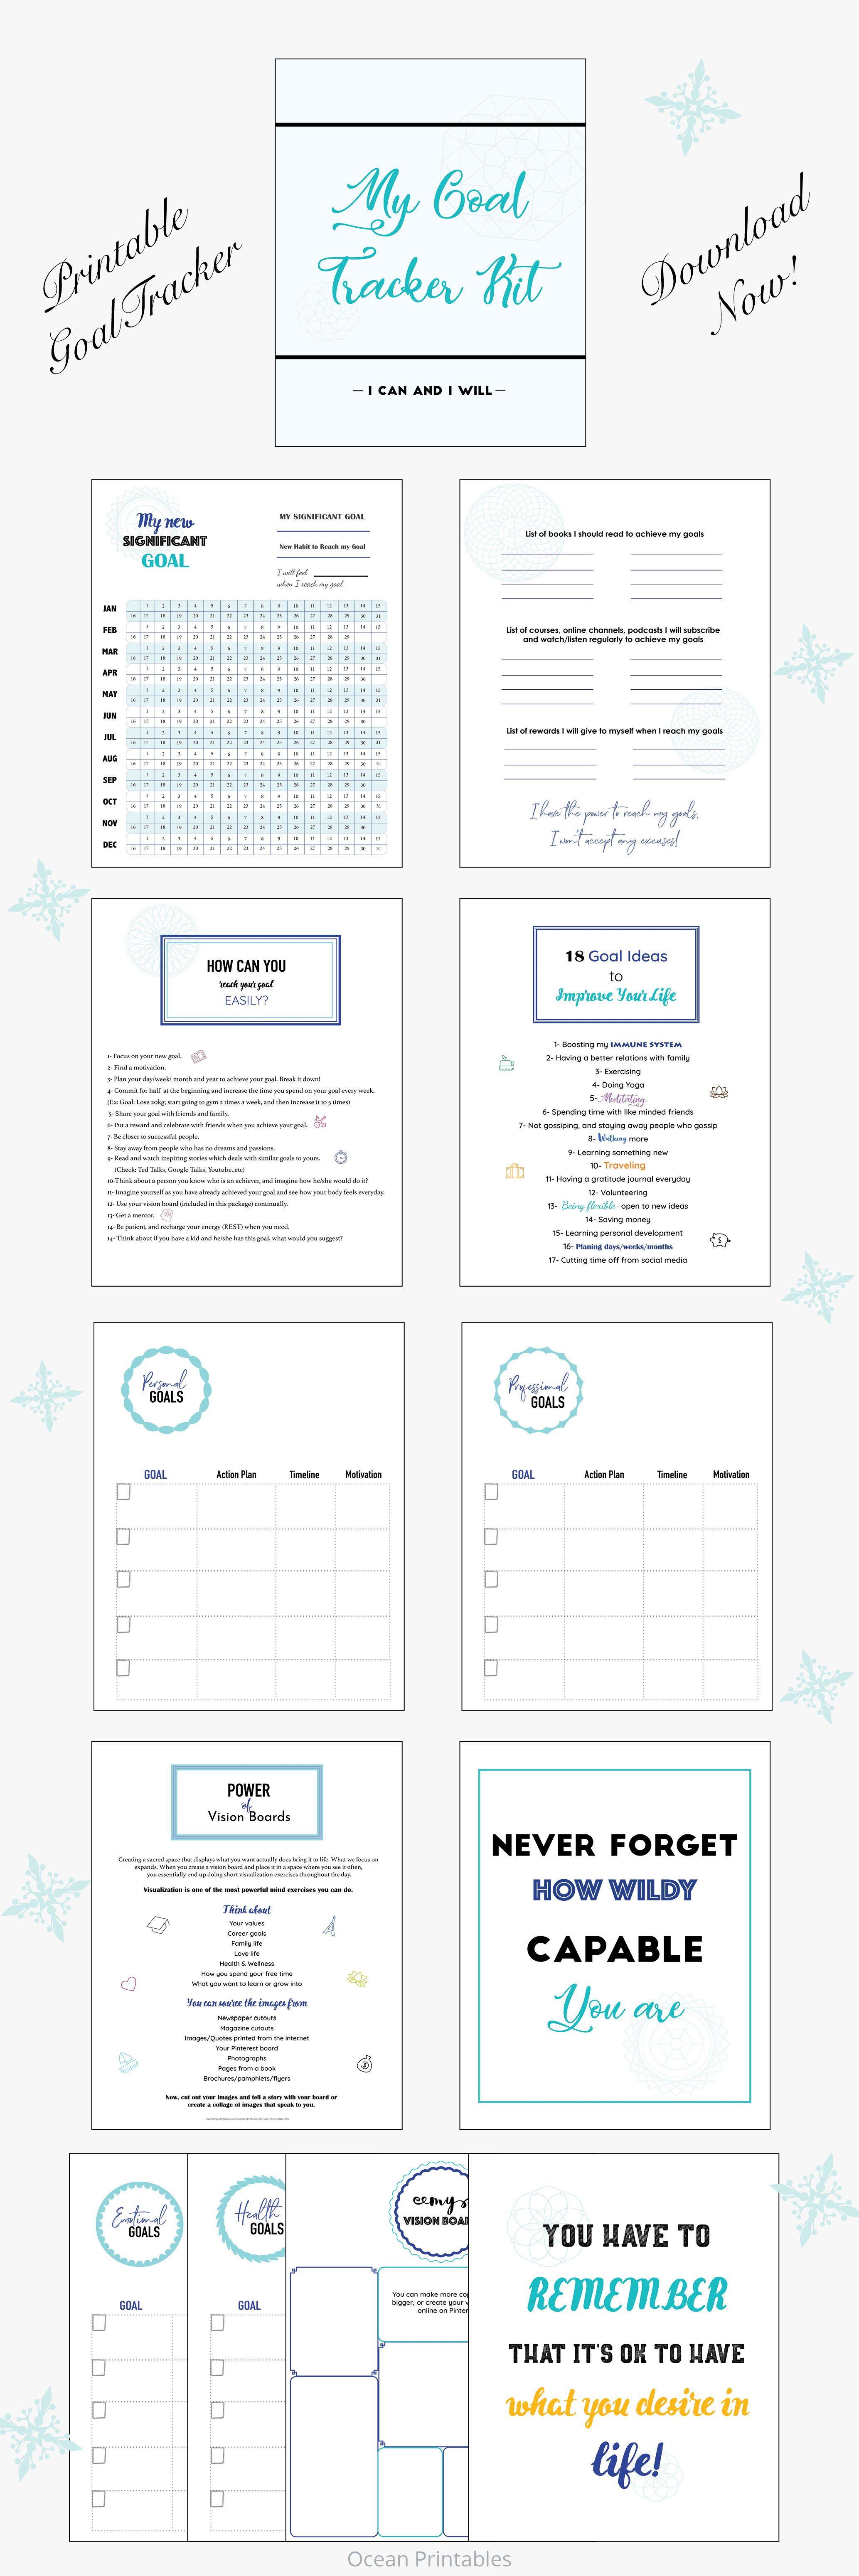 Ultimate Goal Planner Minimalist Printable Daily